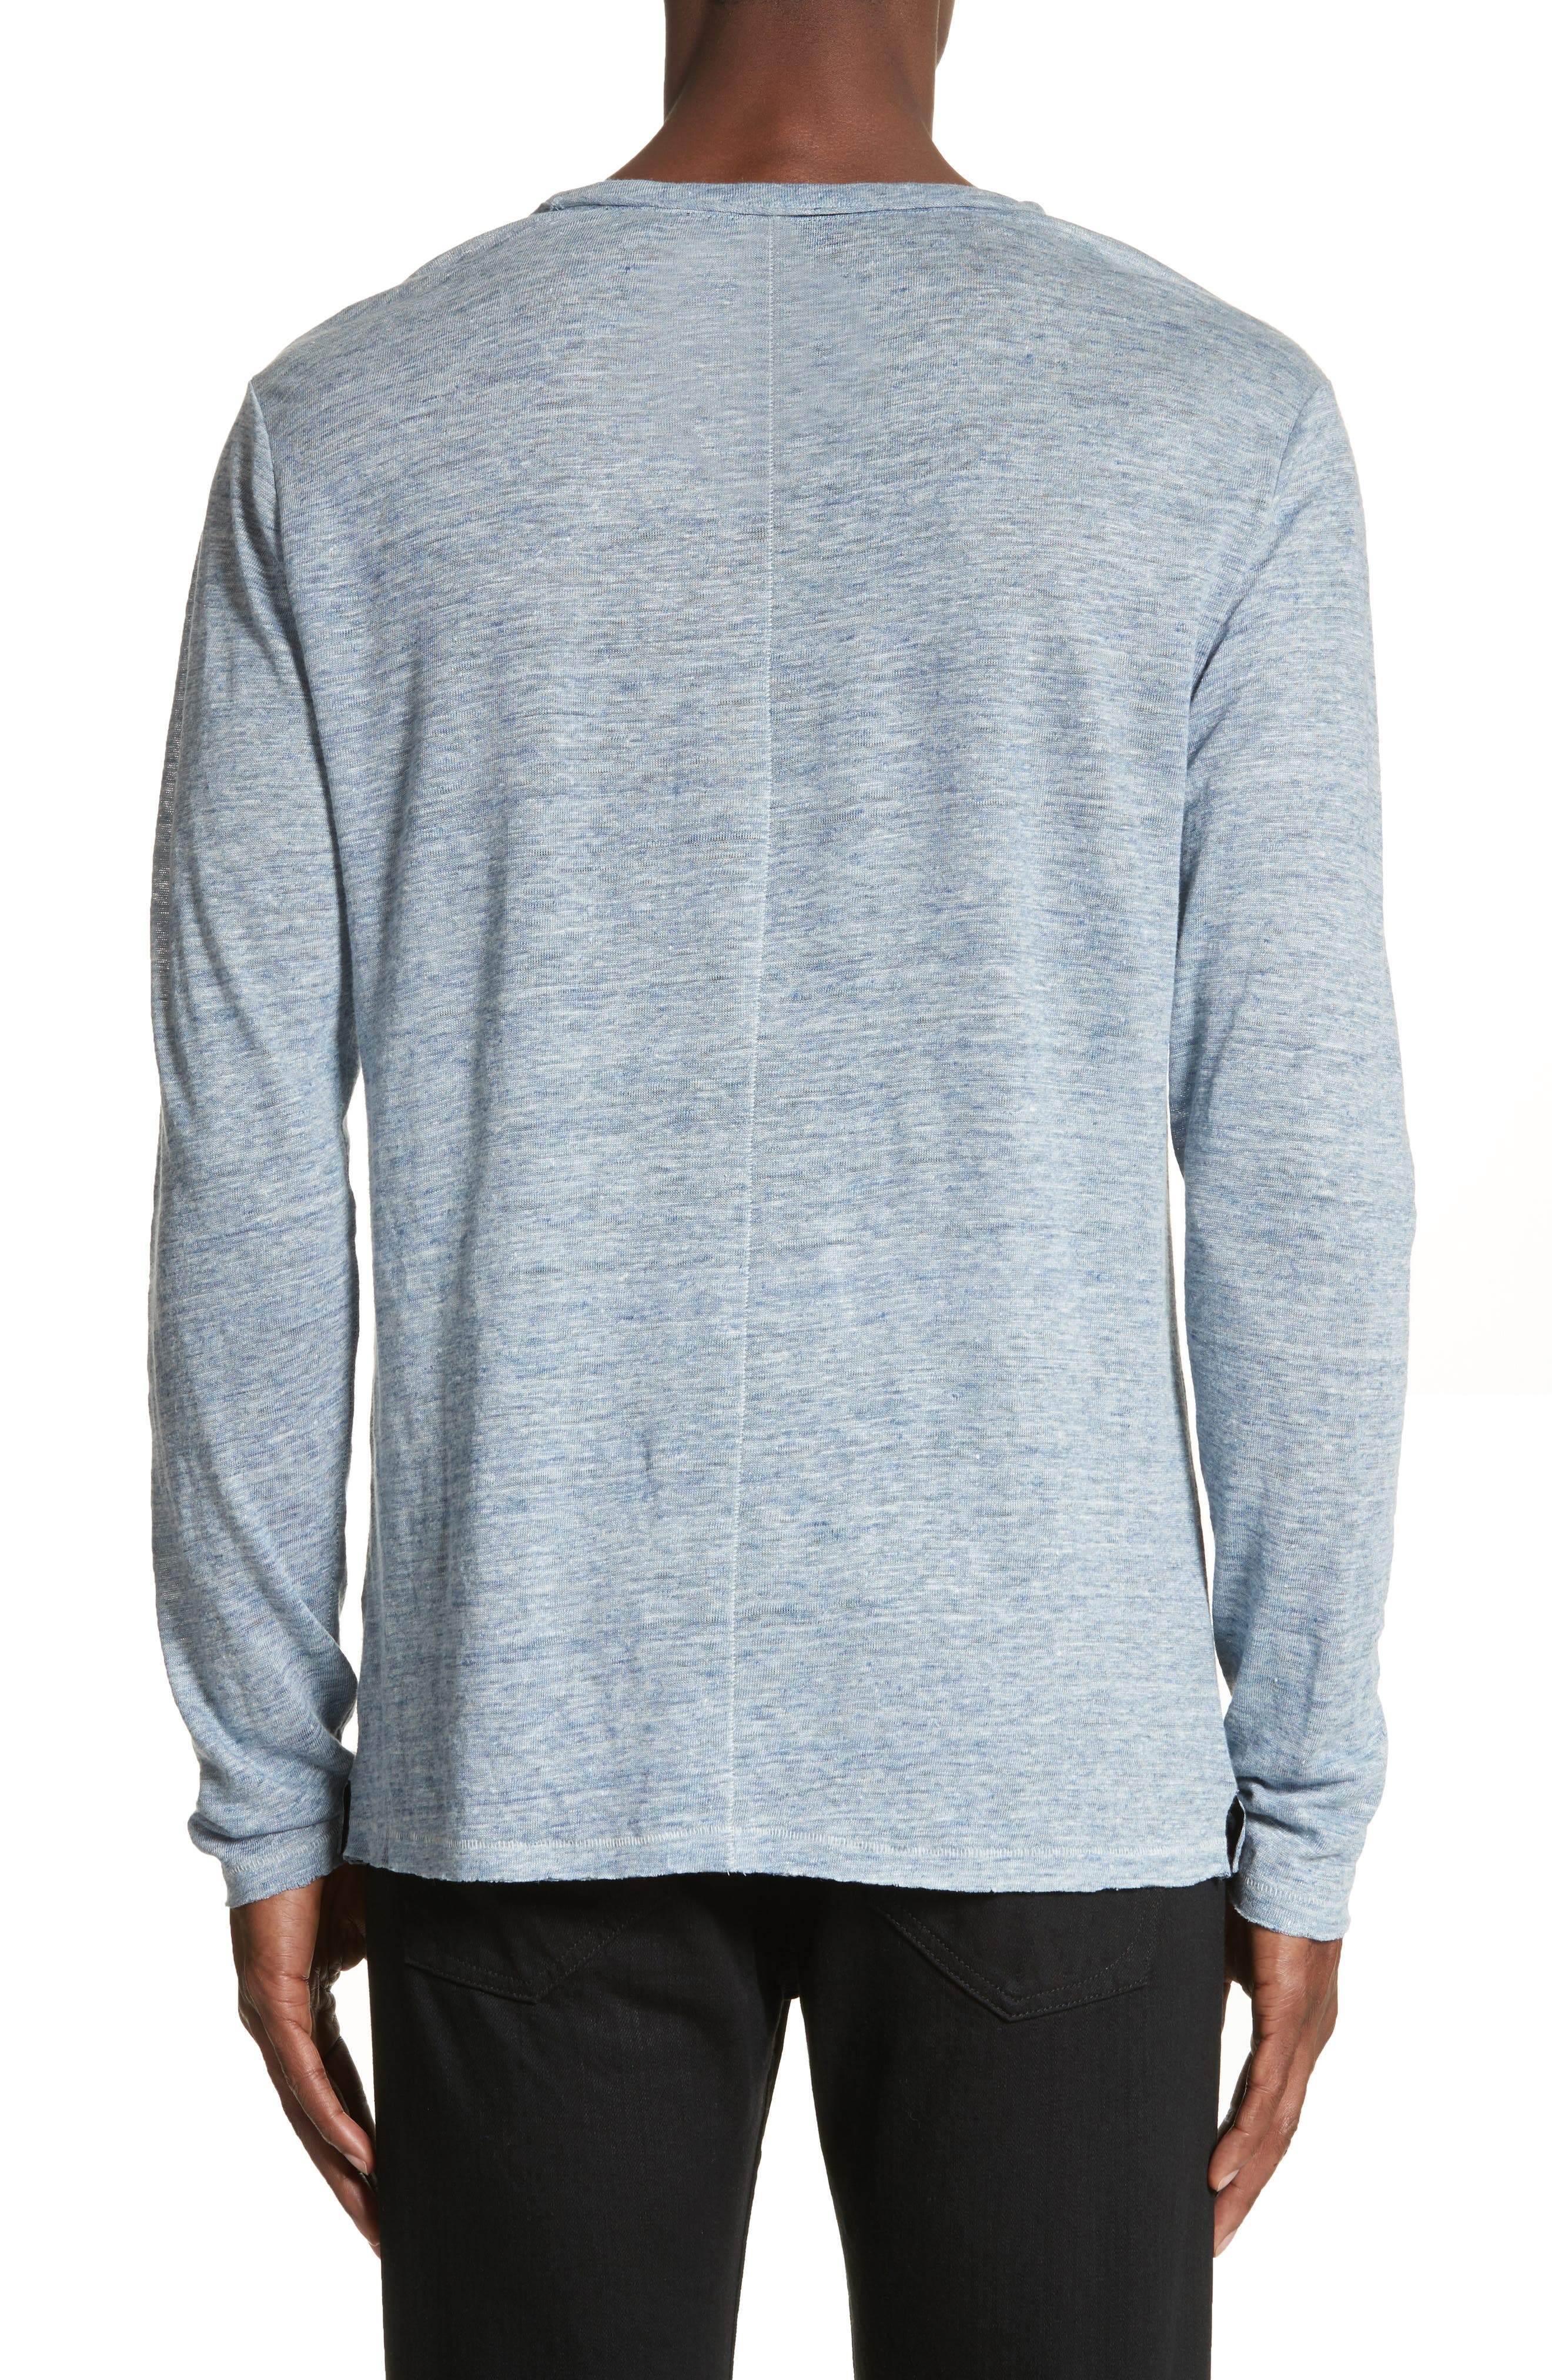 Owen Linen Long Sleeve T-Shirt,                             Alternate thumbnail 2, color,                             Blue